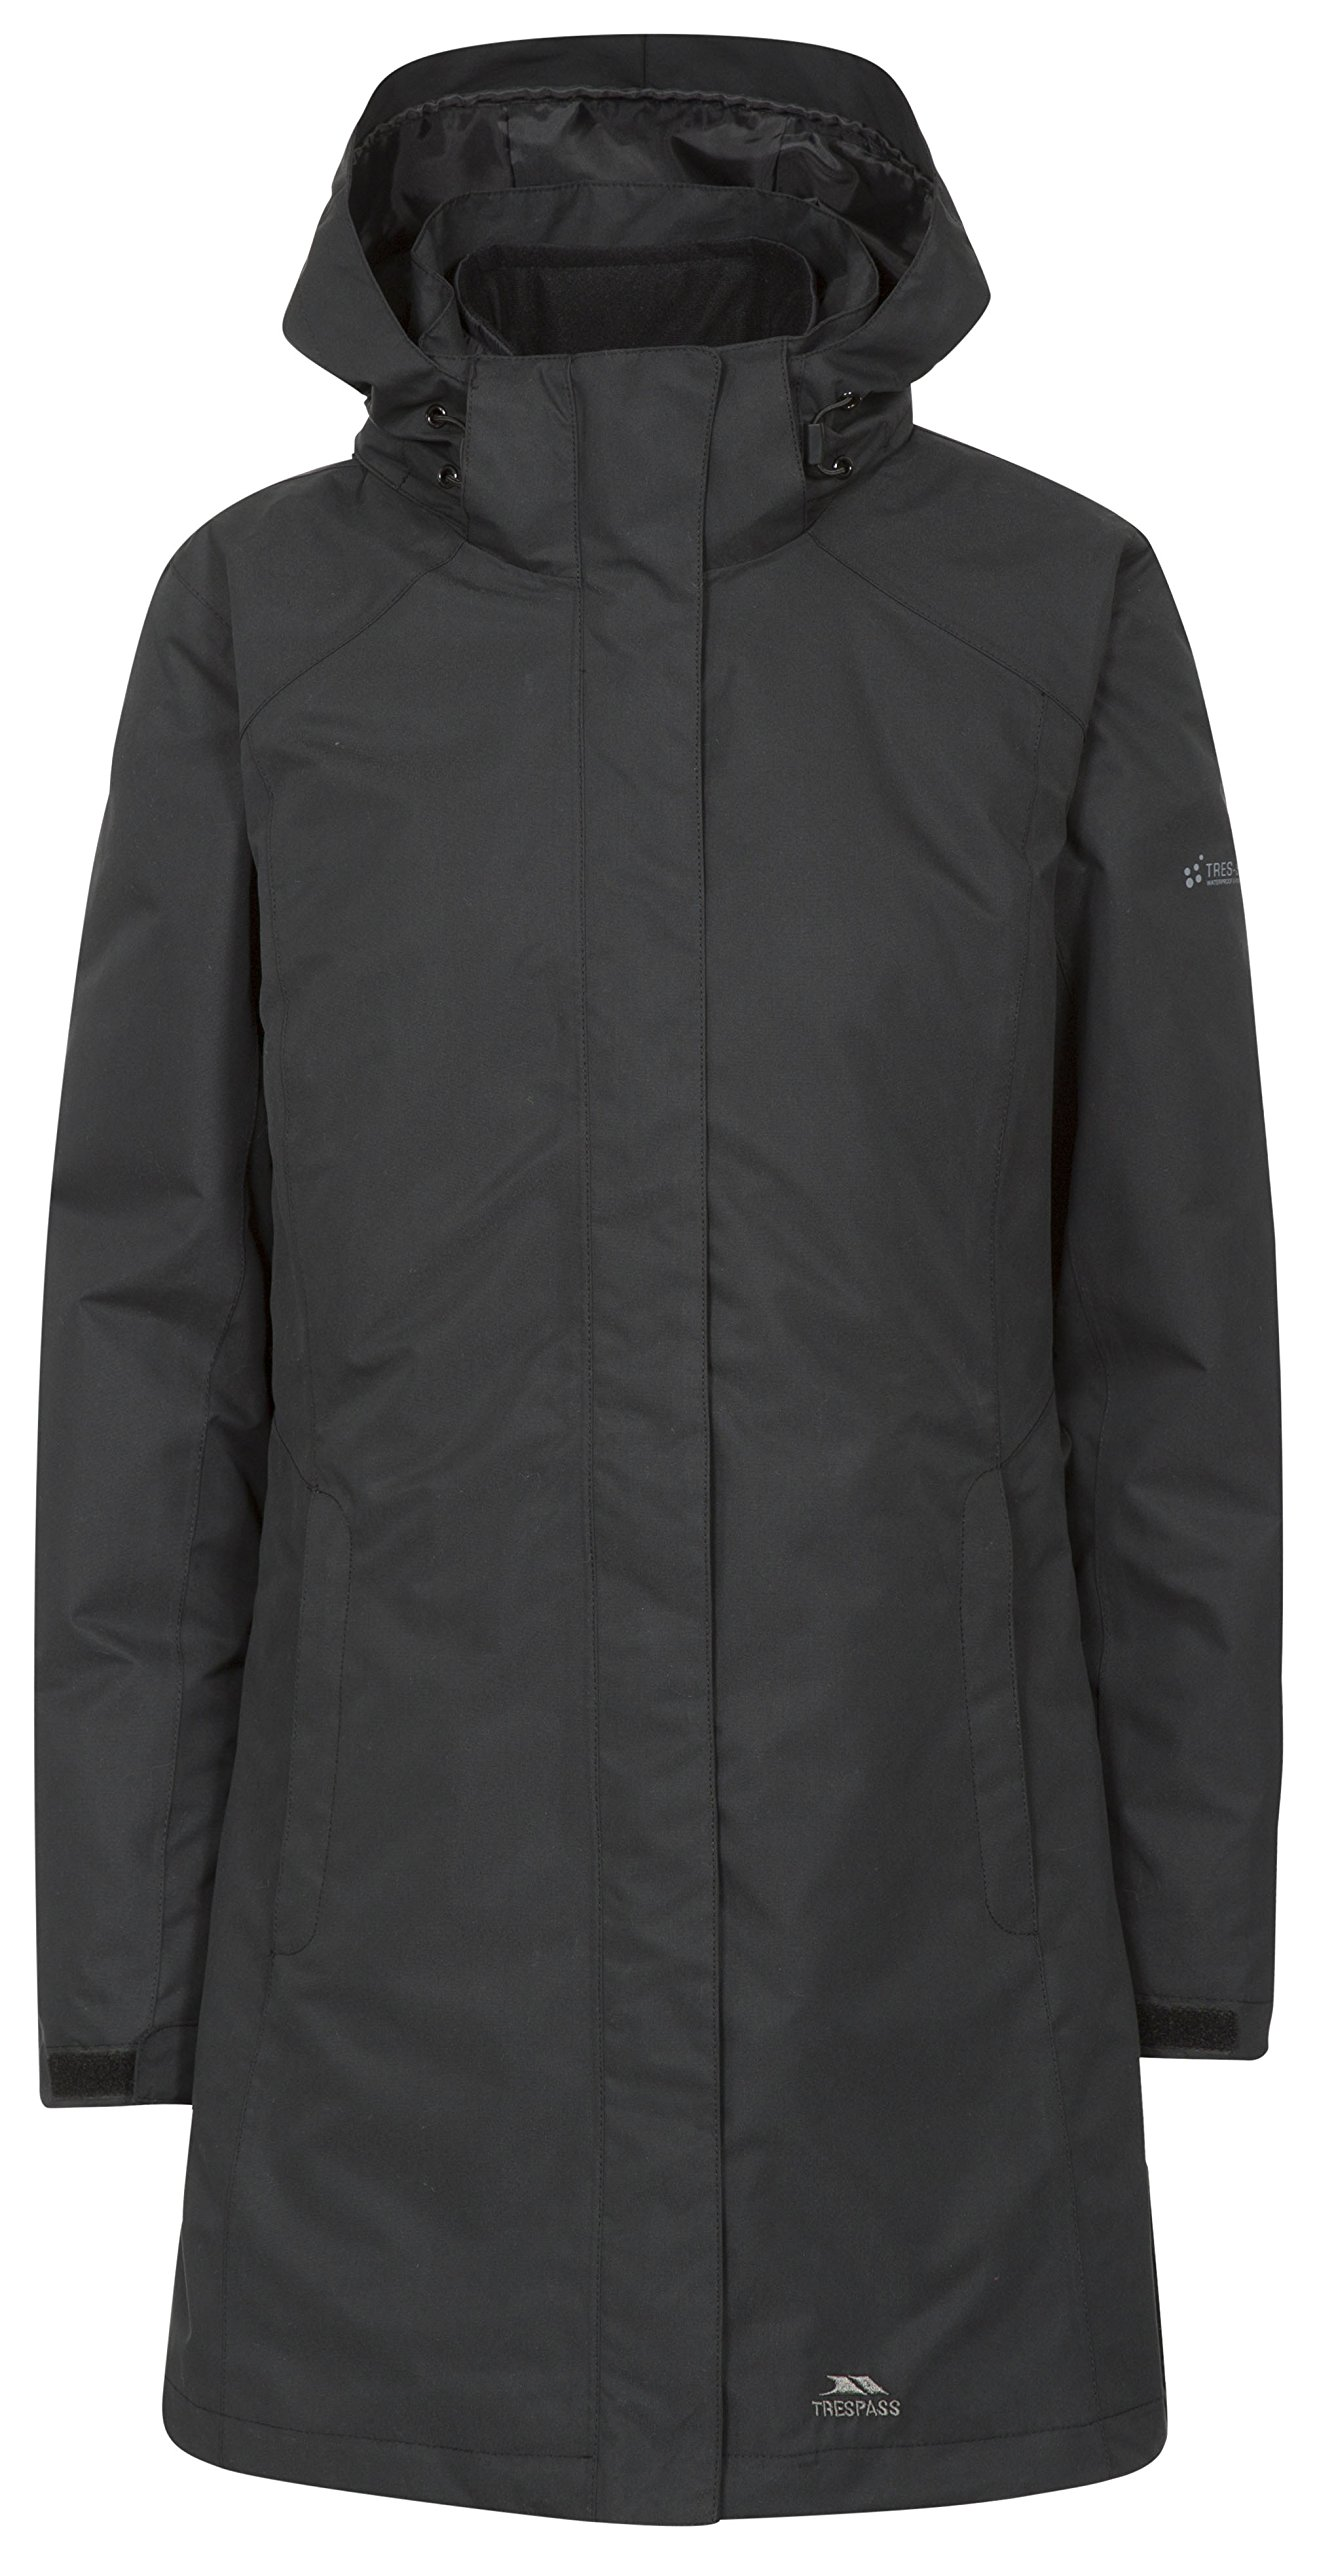 Trespass Alissa II Womens Waterproof 3 in 1 Jacket with Hood 3